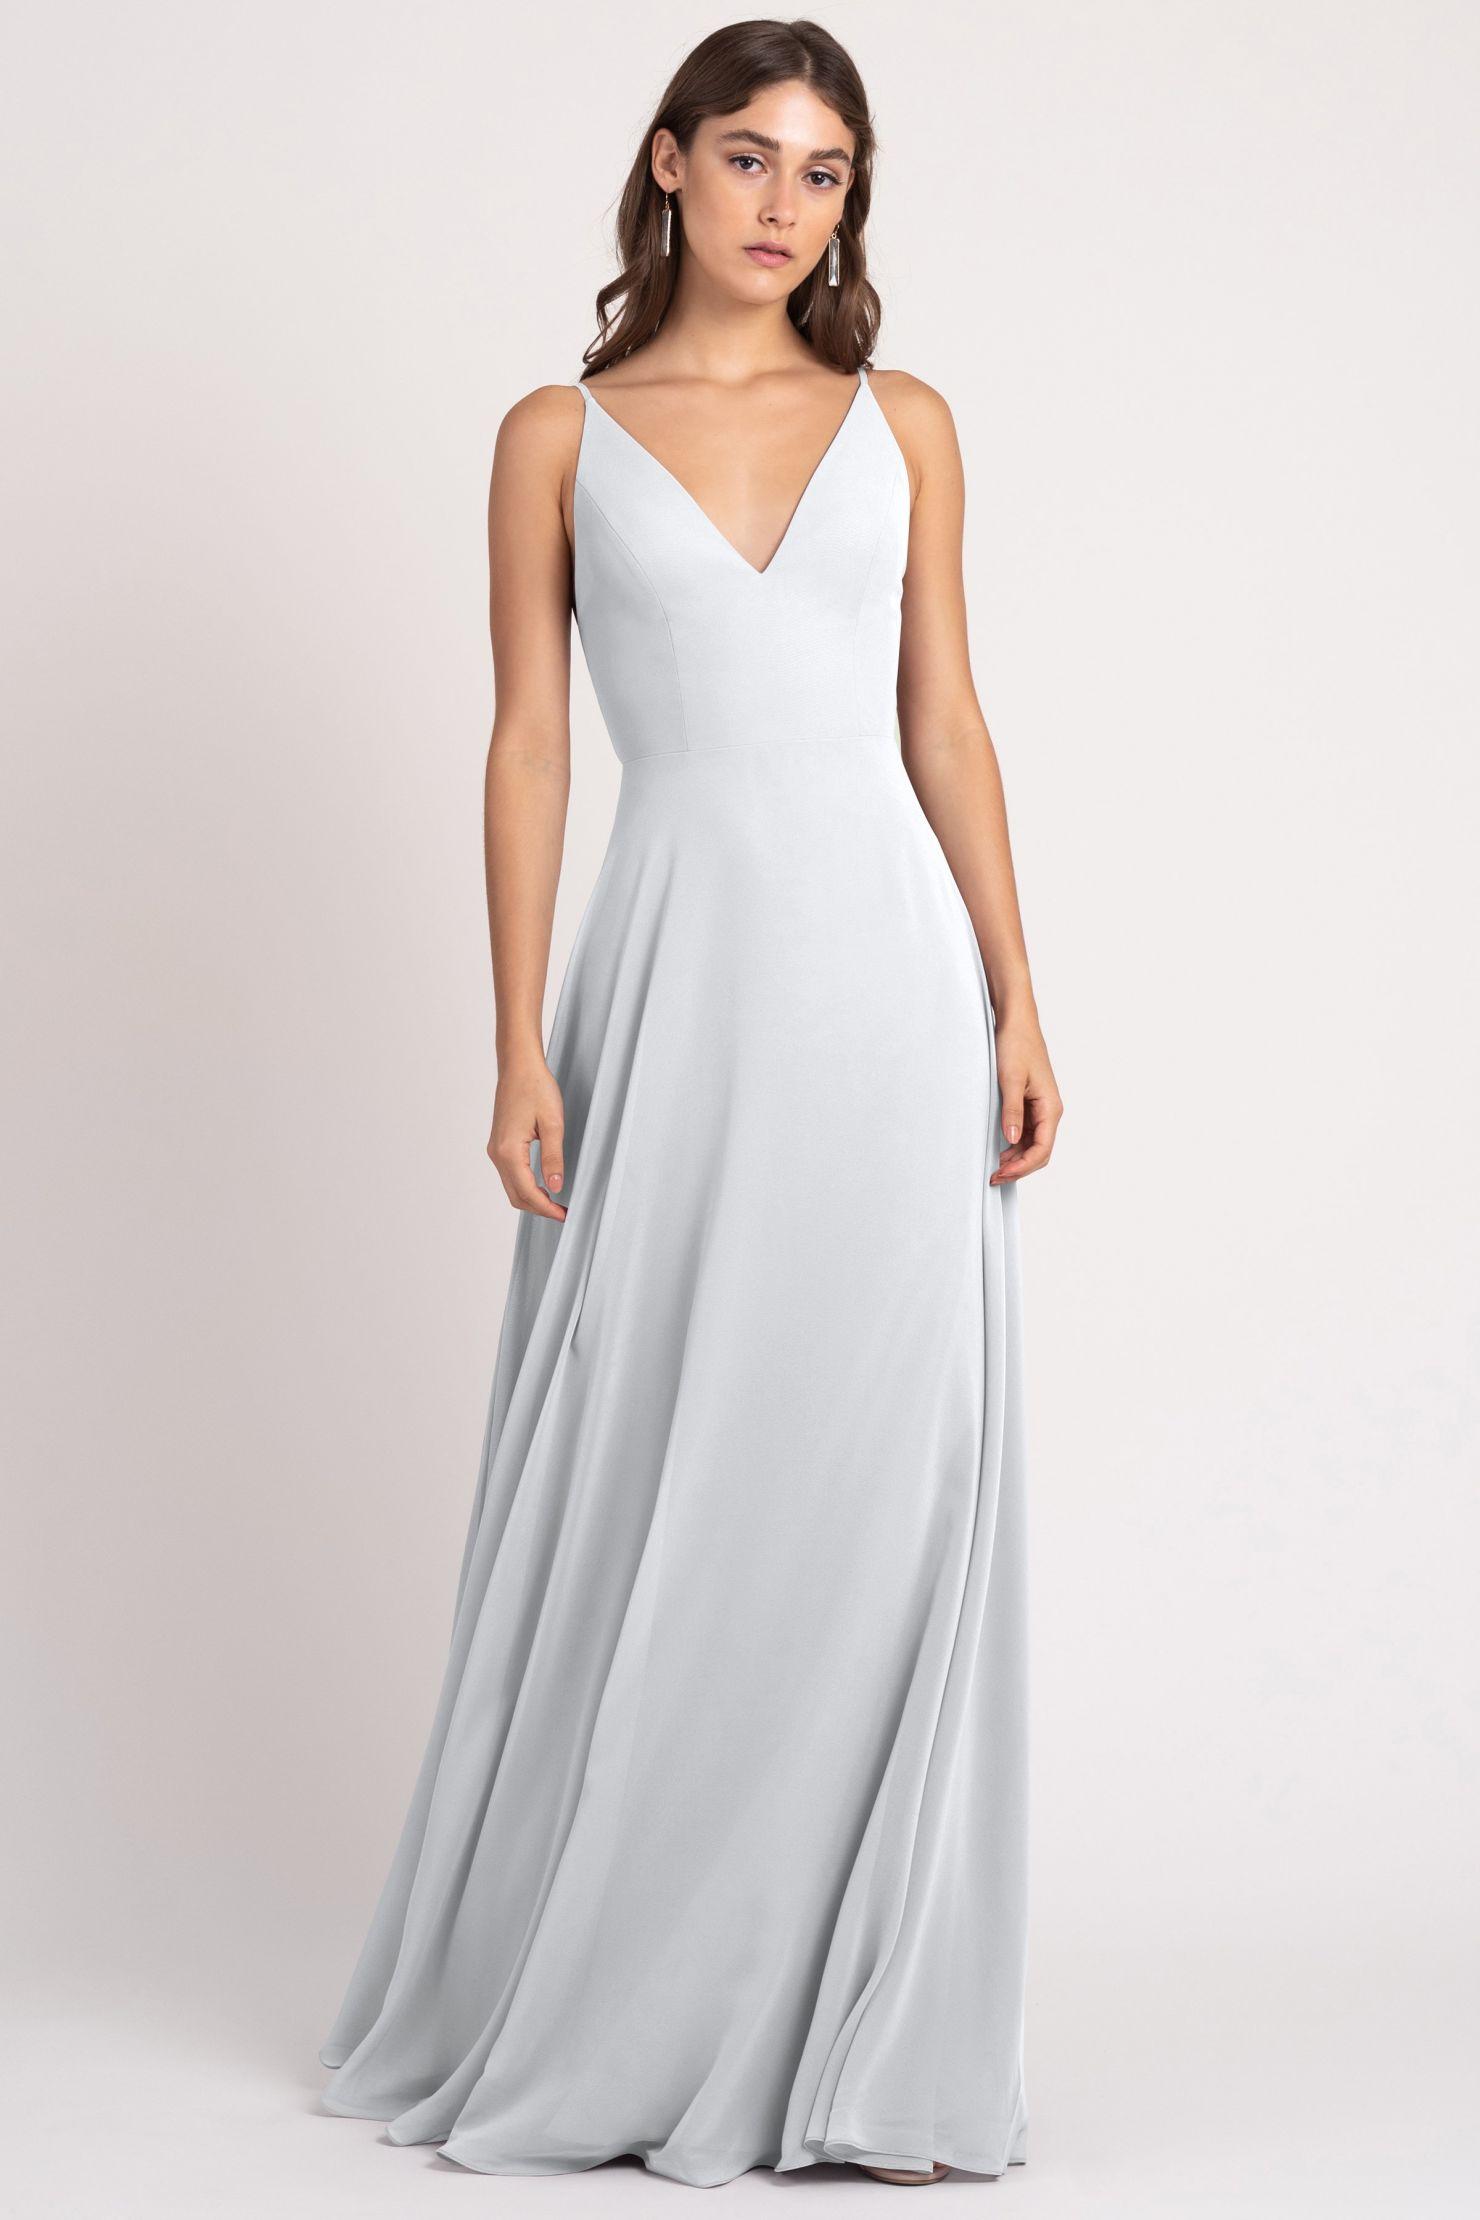 Dani Bridesmaids Dress by Jenny Yoo - Cloud